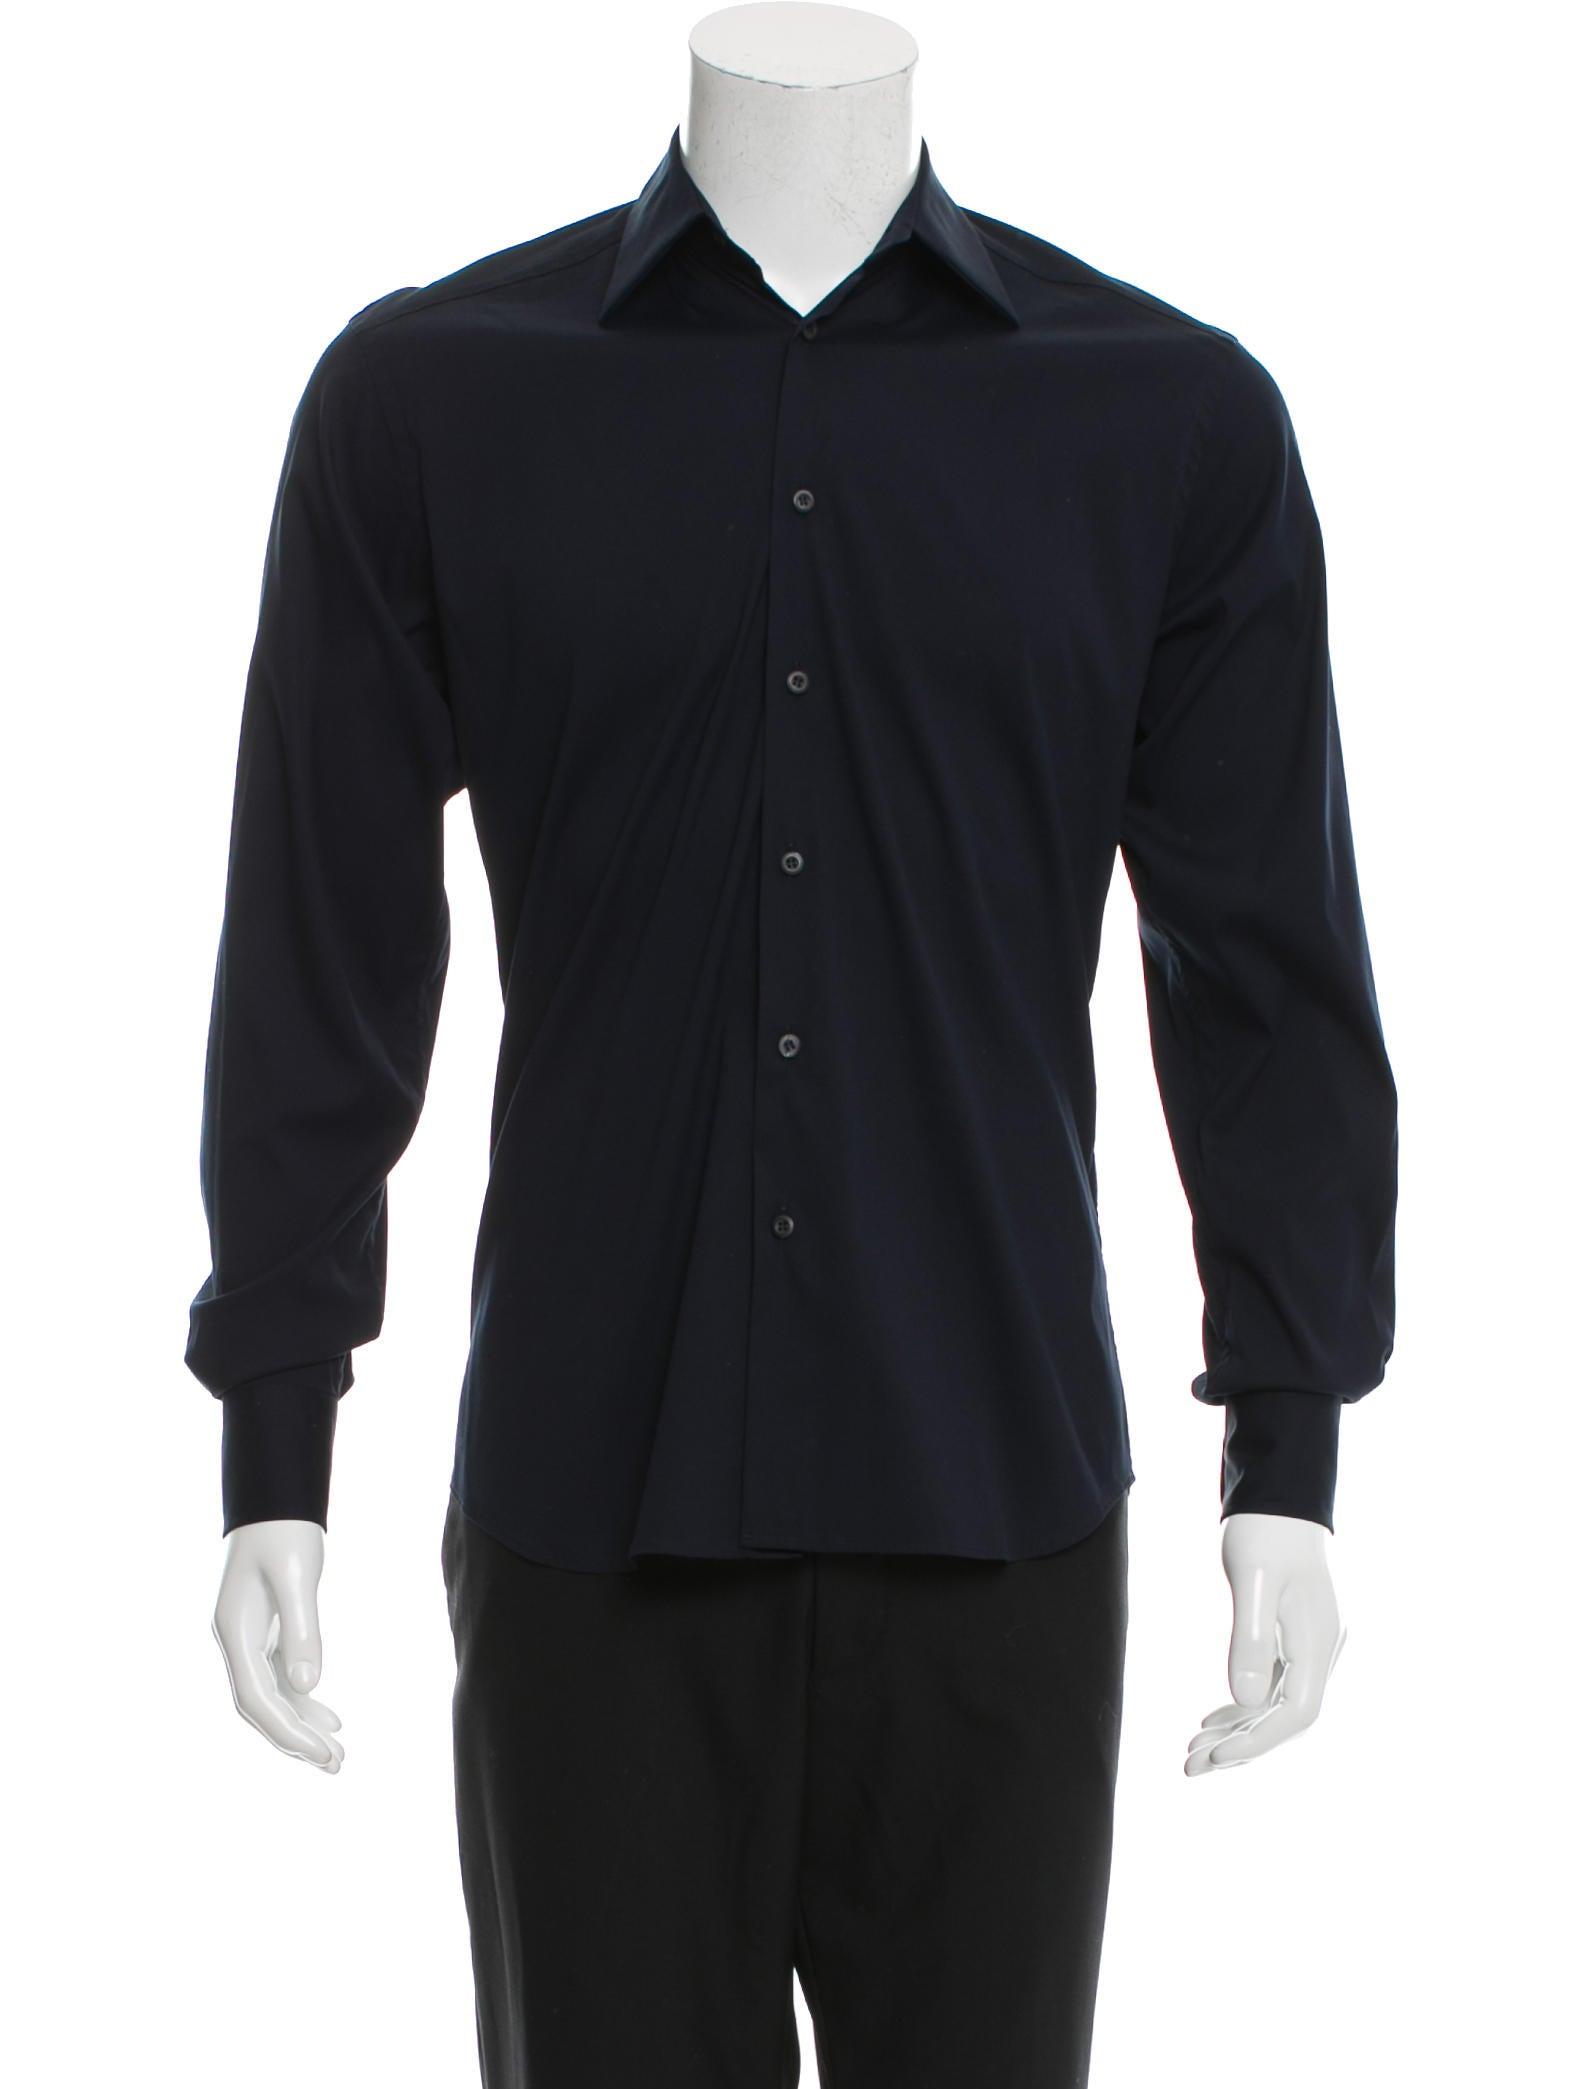 Prada Long Sleeve Button Up Shirt Clothing Pra143075